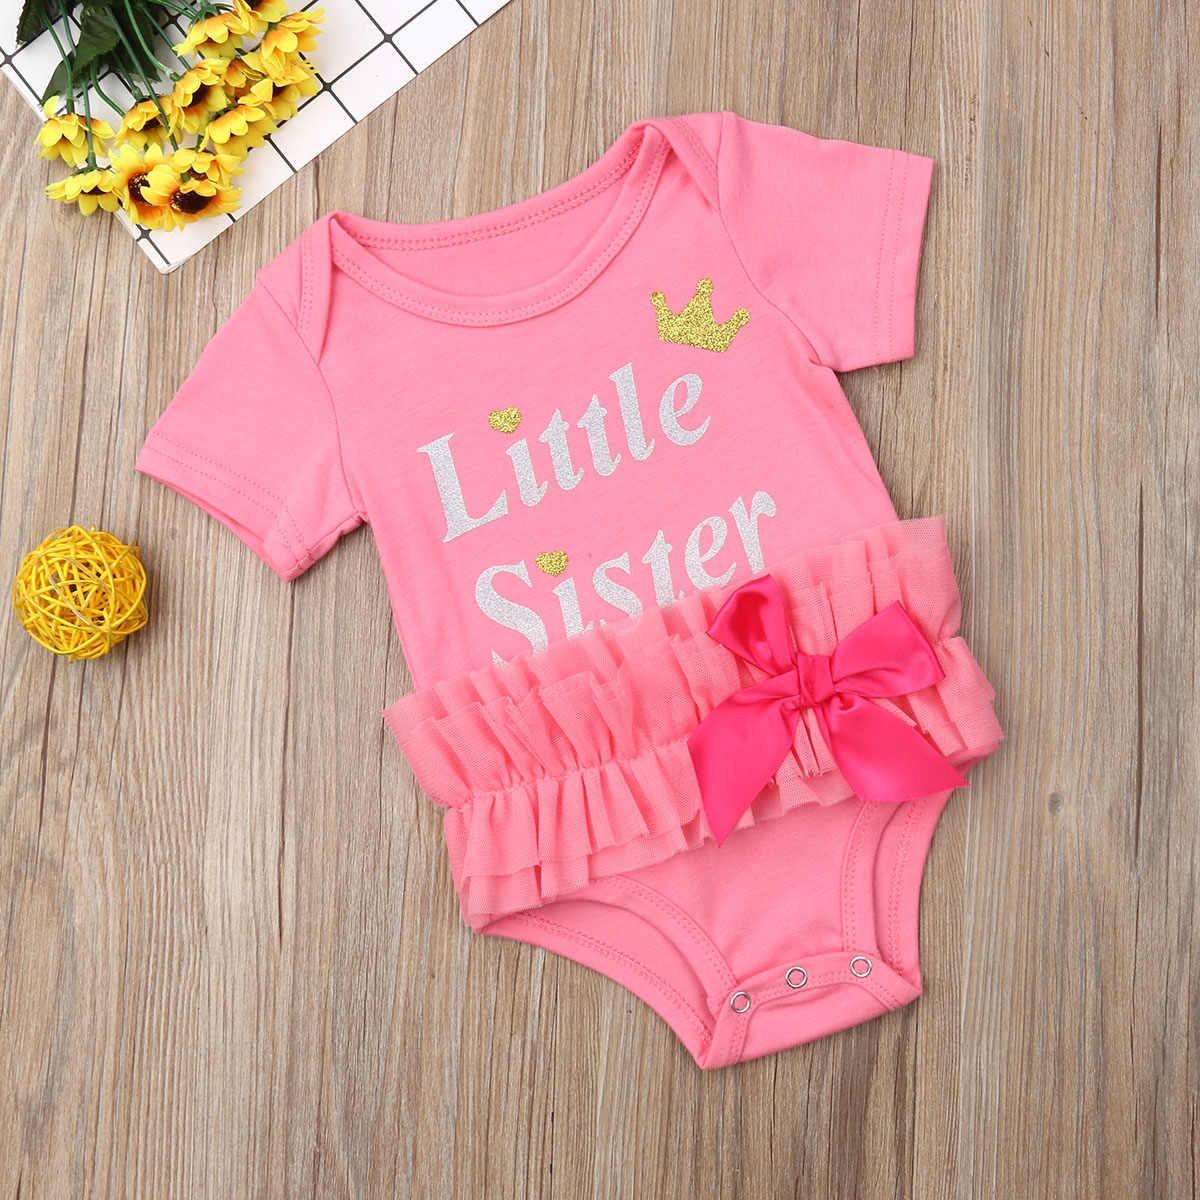 Pudcoco Leuke Zusje Pasgeboren Baby Baby Girl Chiffon Ruffle Romper Jumpsuit Playsuit Zomer Katoen Outfit